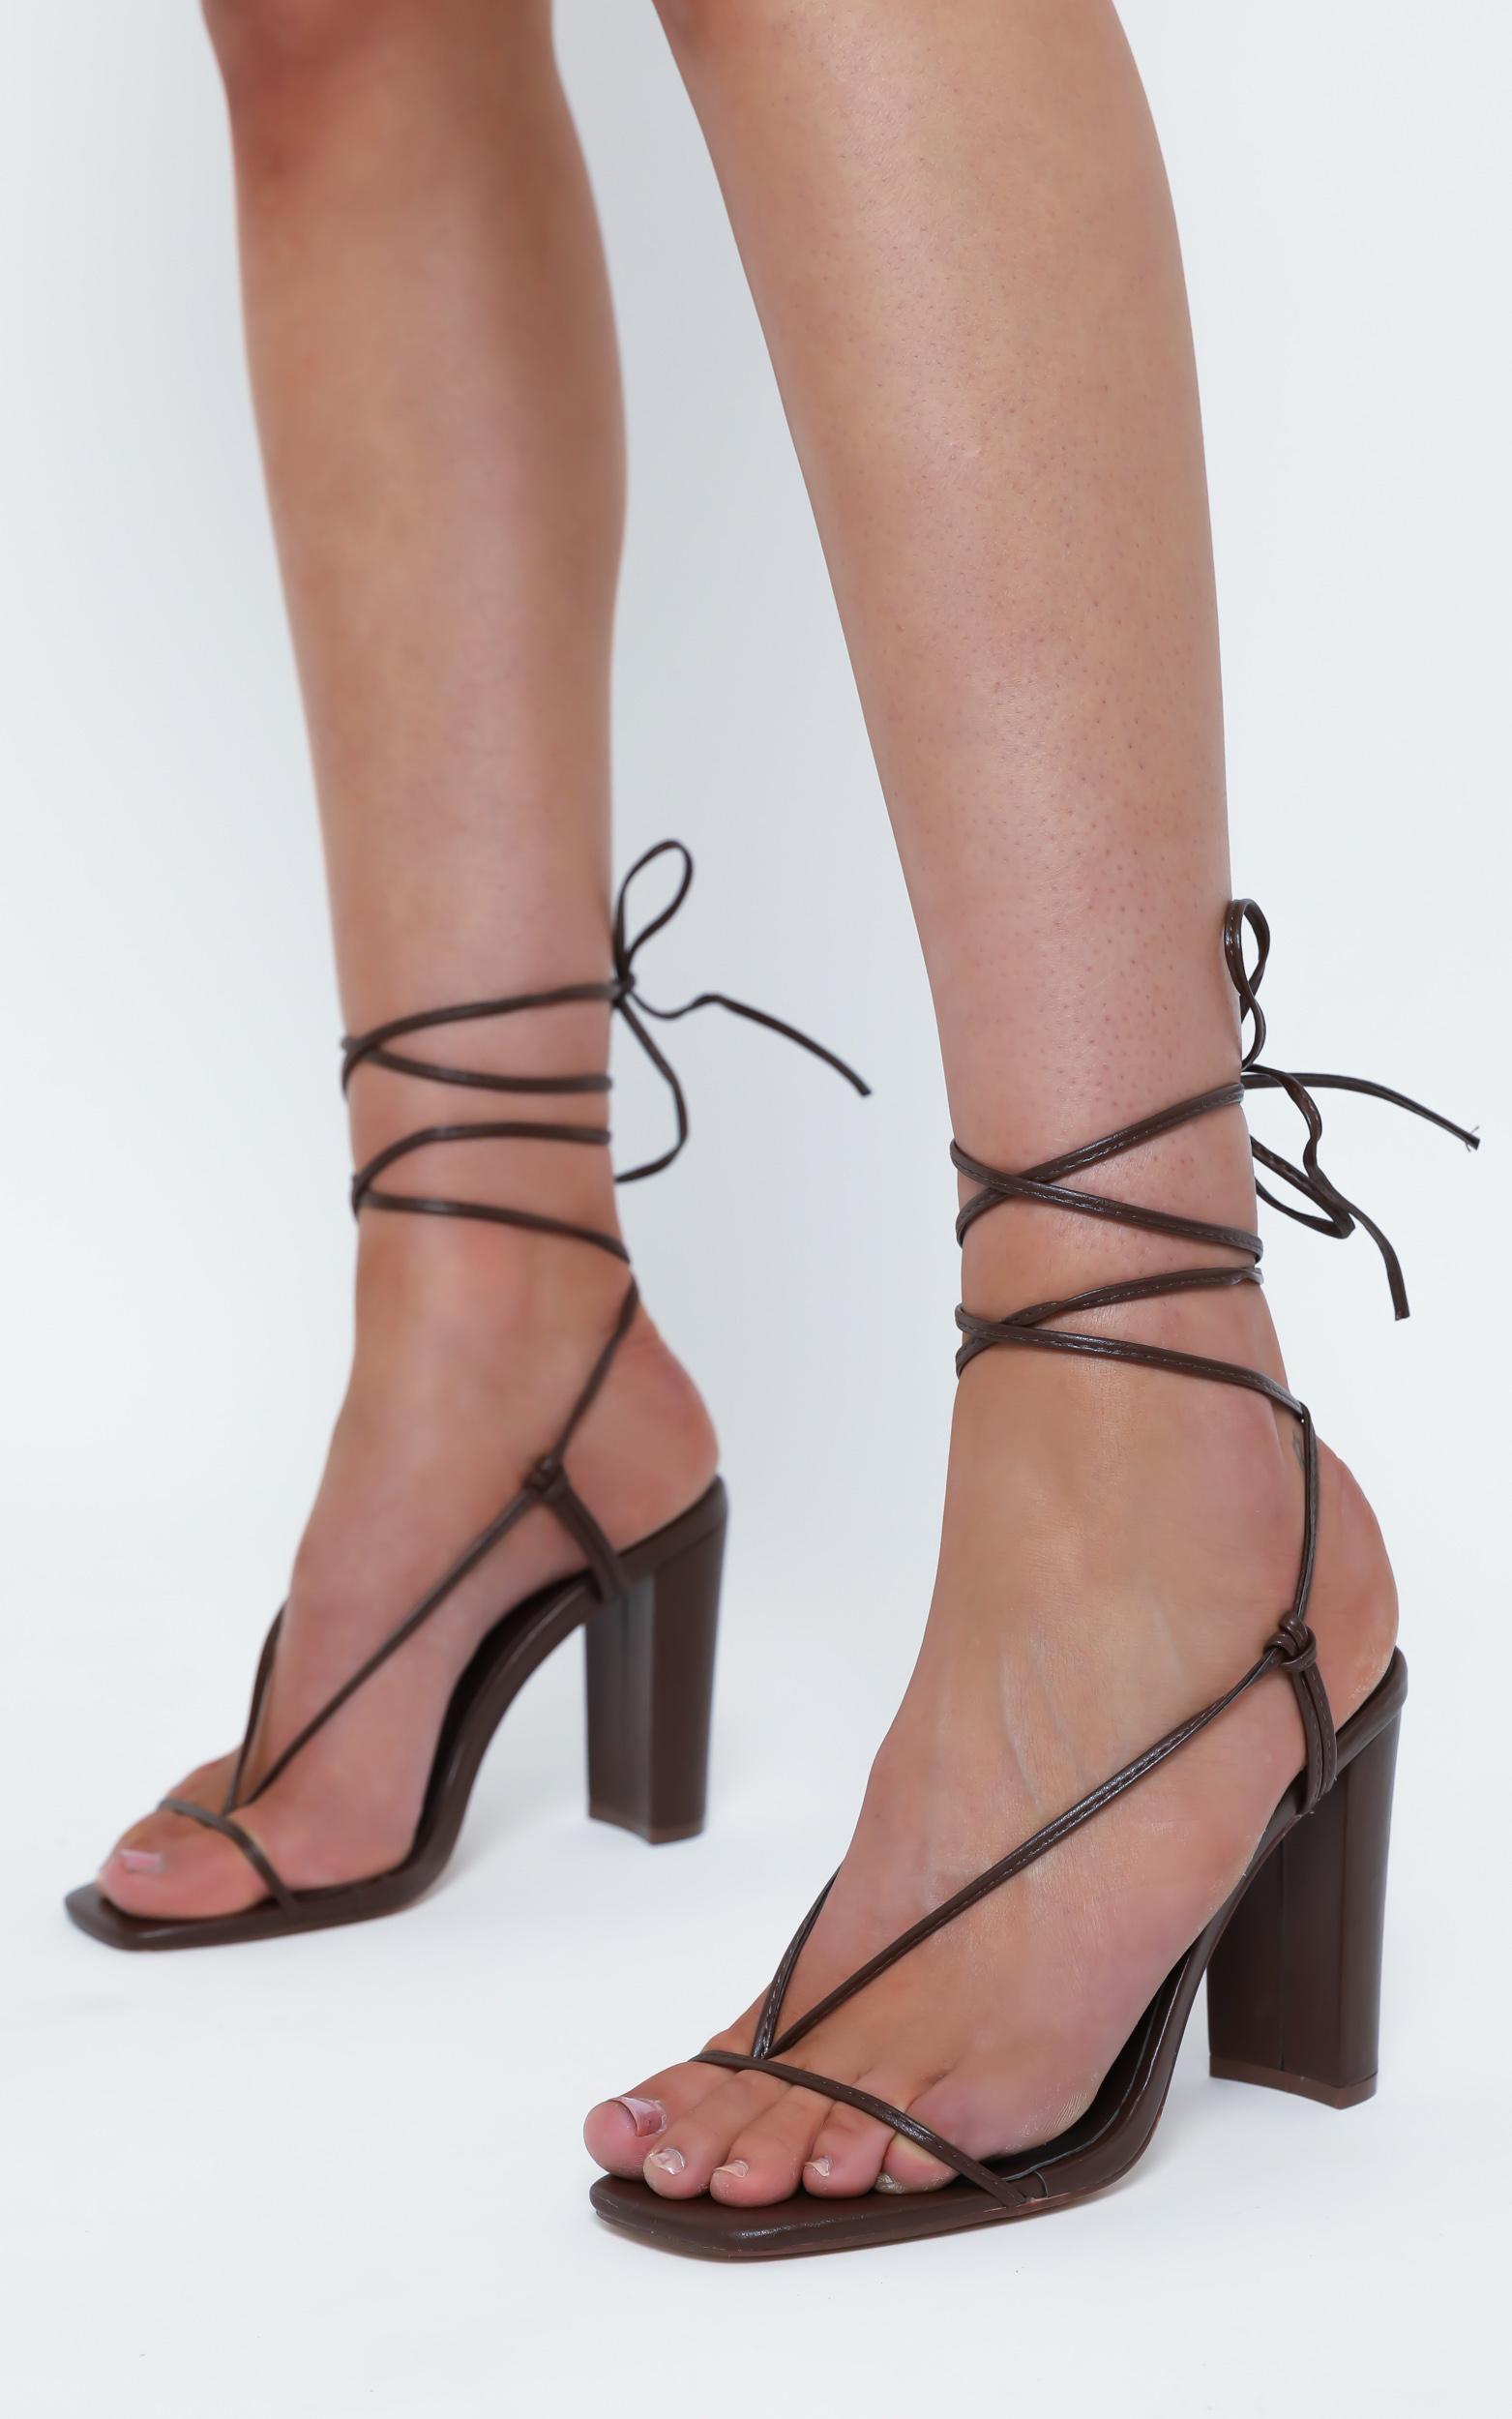 Billini - Virden Heels in Chocolate - 5, Brown, hi-res image number null